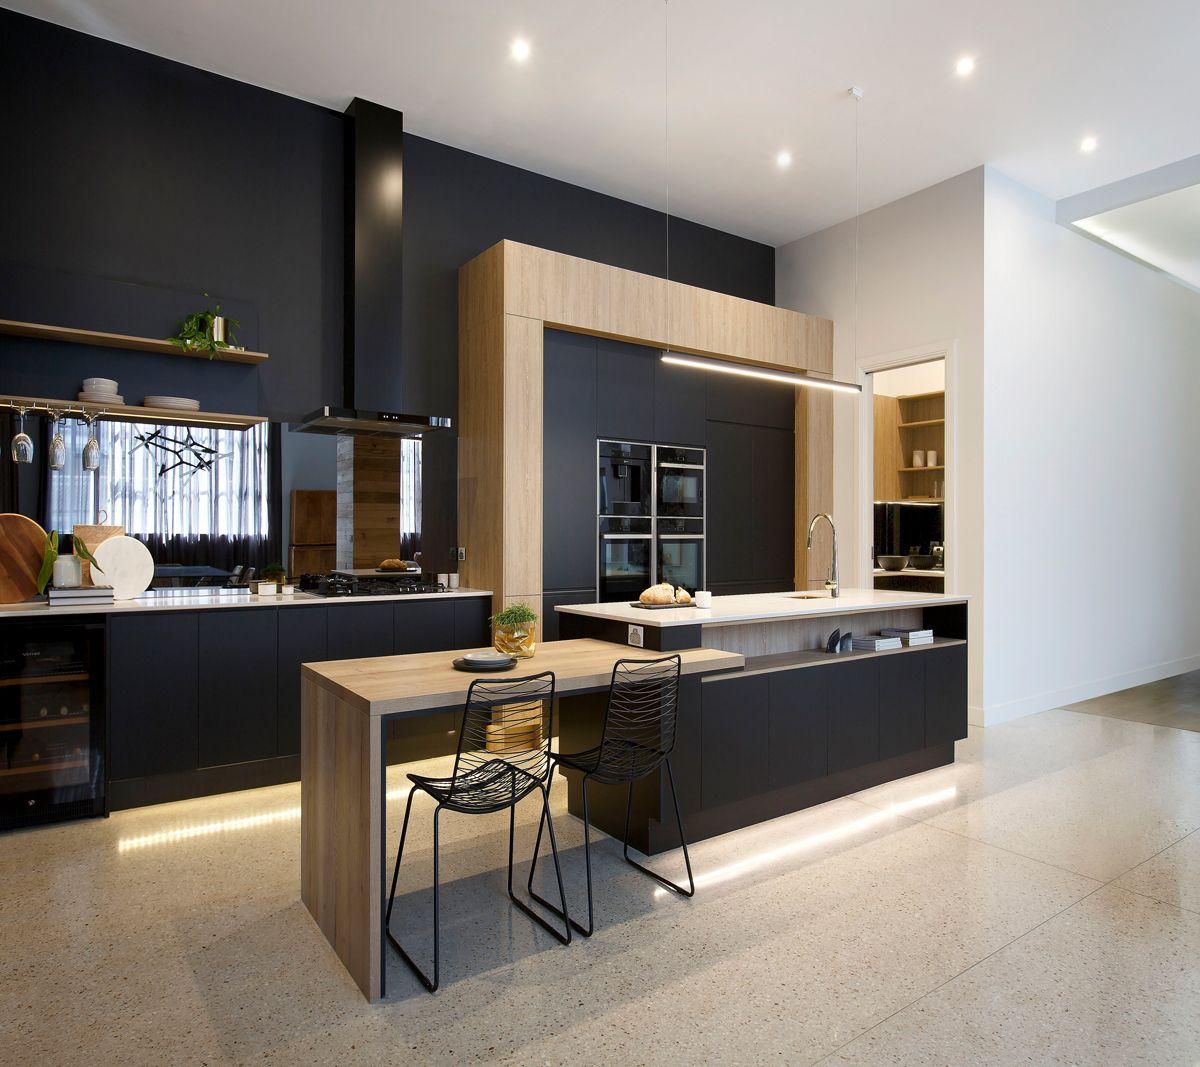 The Block 2016 Apartment One Karlie & Will Небольшие